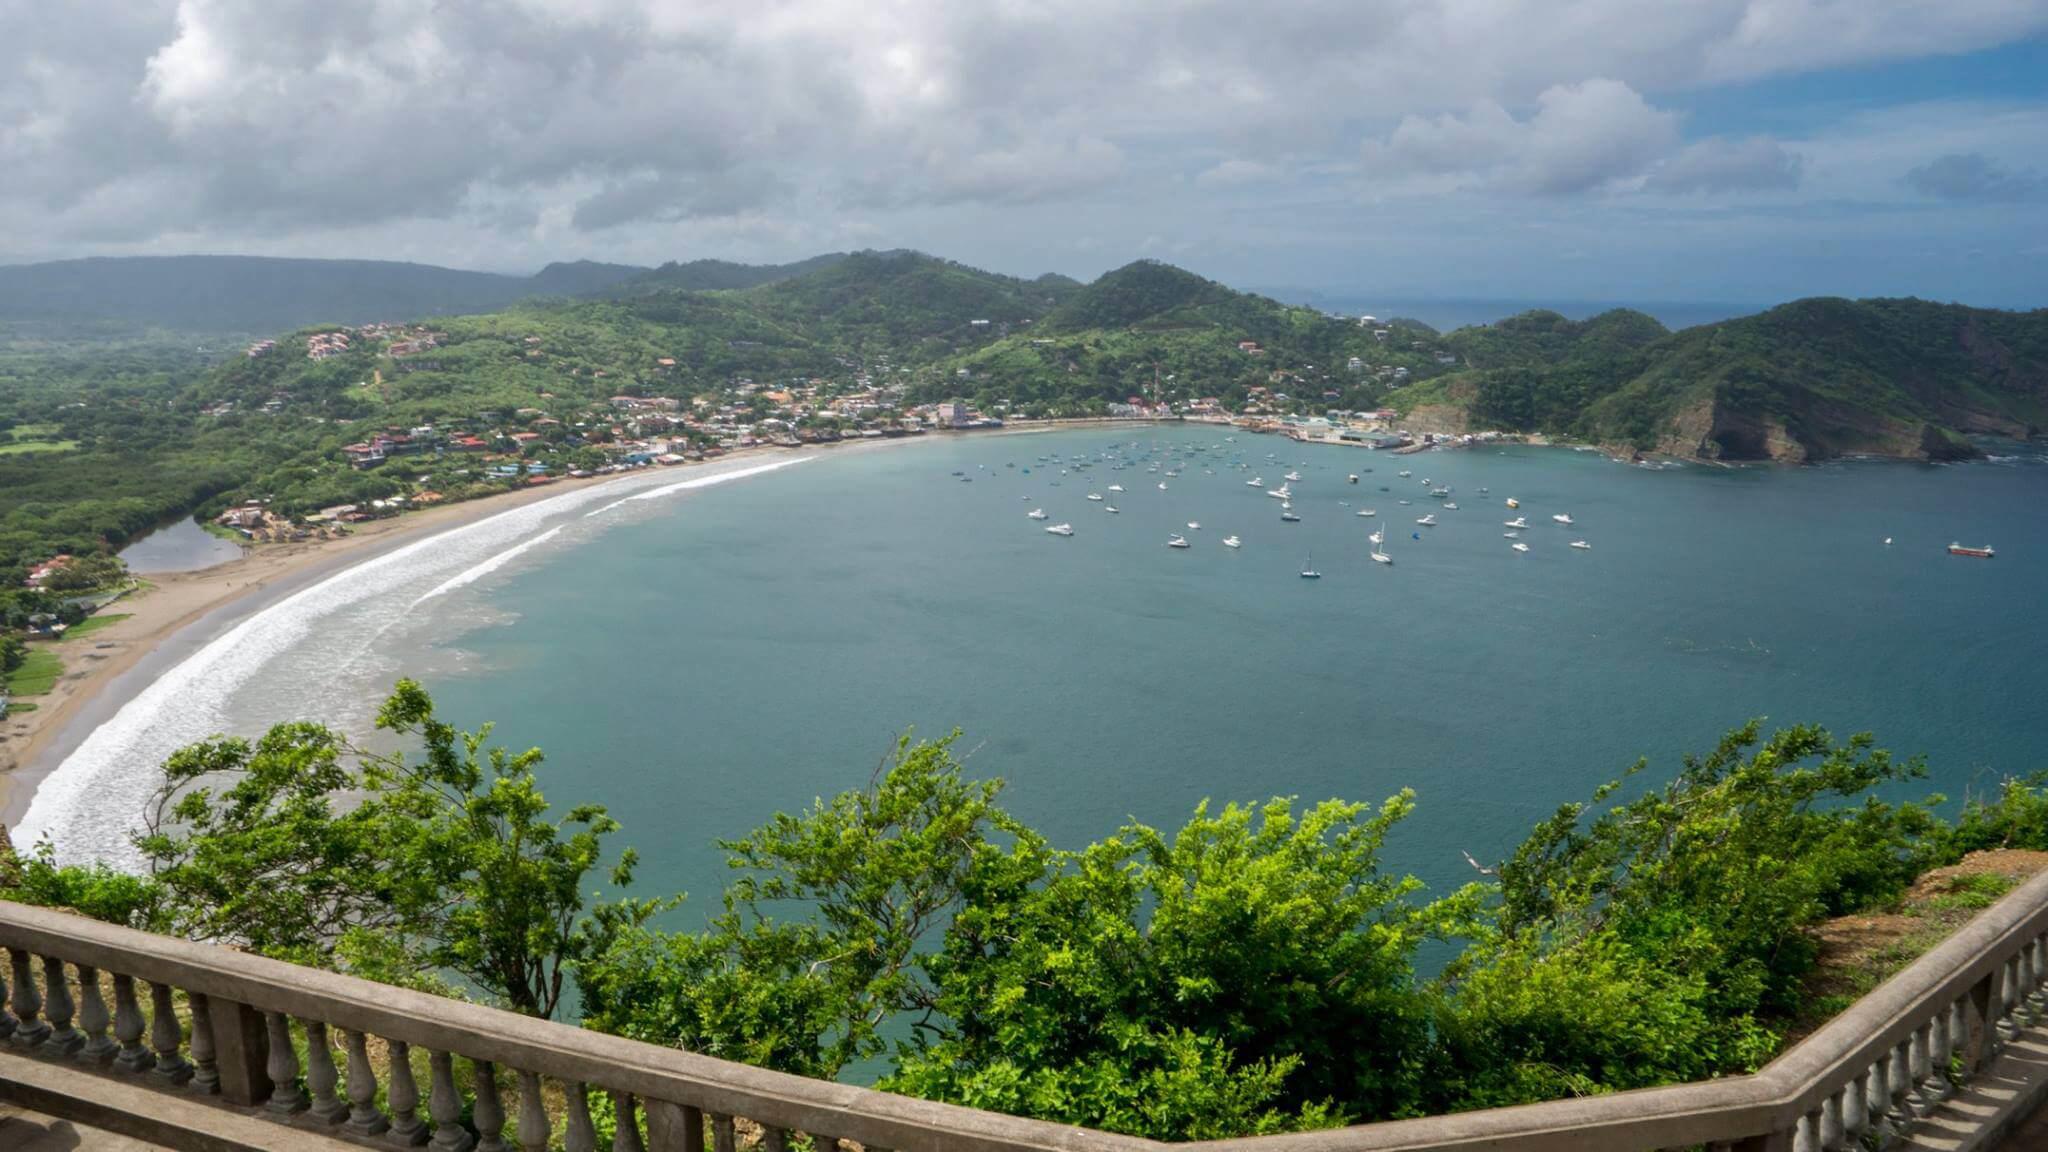 blog-explore-central-america-jesus-hike-nicaragua-san-juan-del-sur